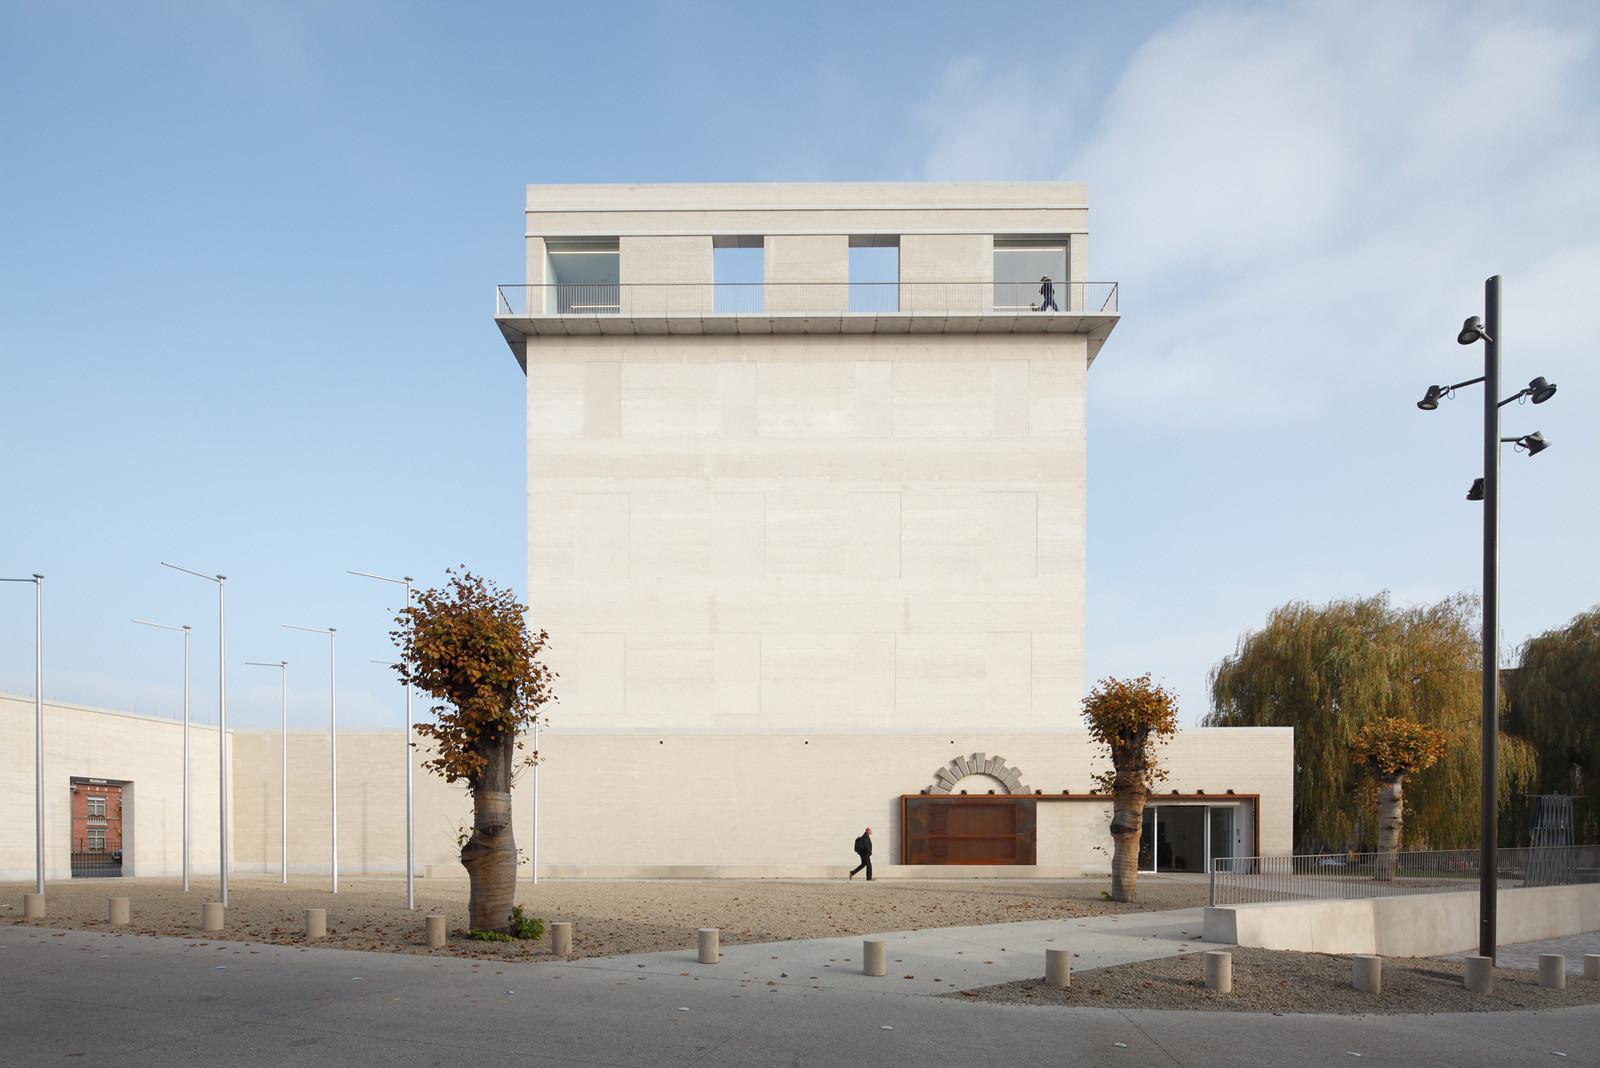 Kazerne Dossin / awg architects, © Stijn Bollaert